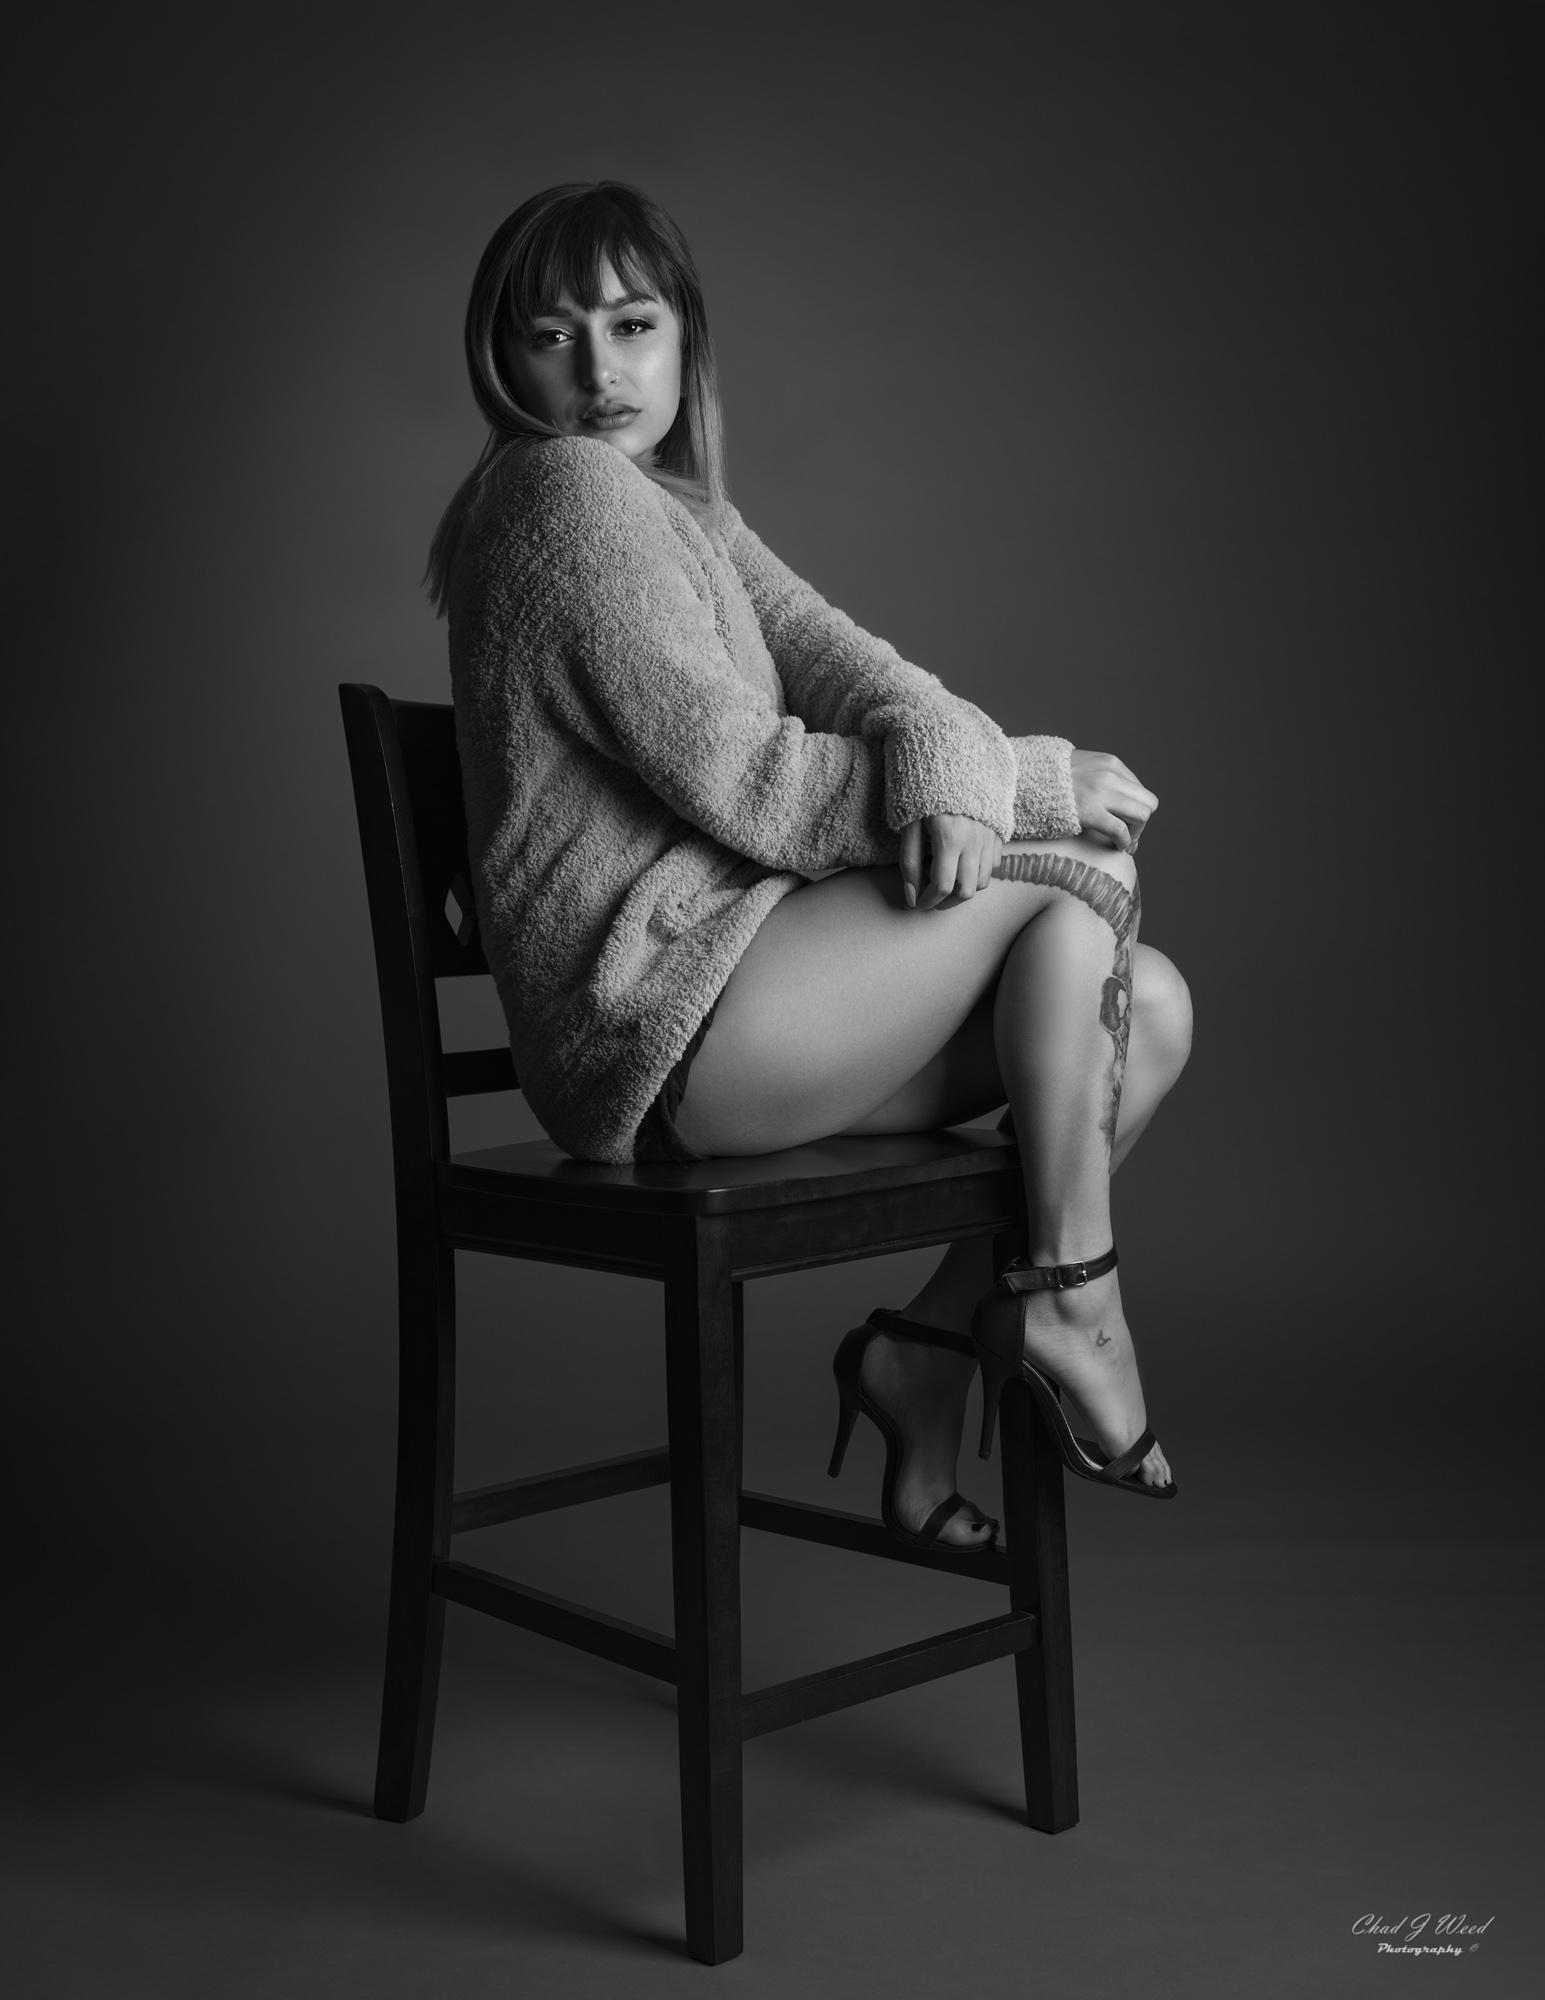 Myrian Alt Fashio Model by Mesa Arizona Portrait Photographer Chad Weed